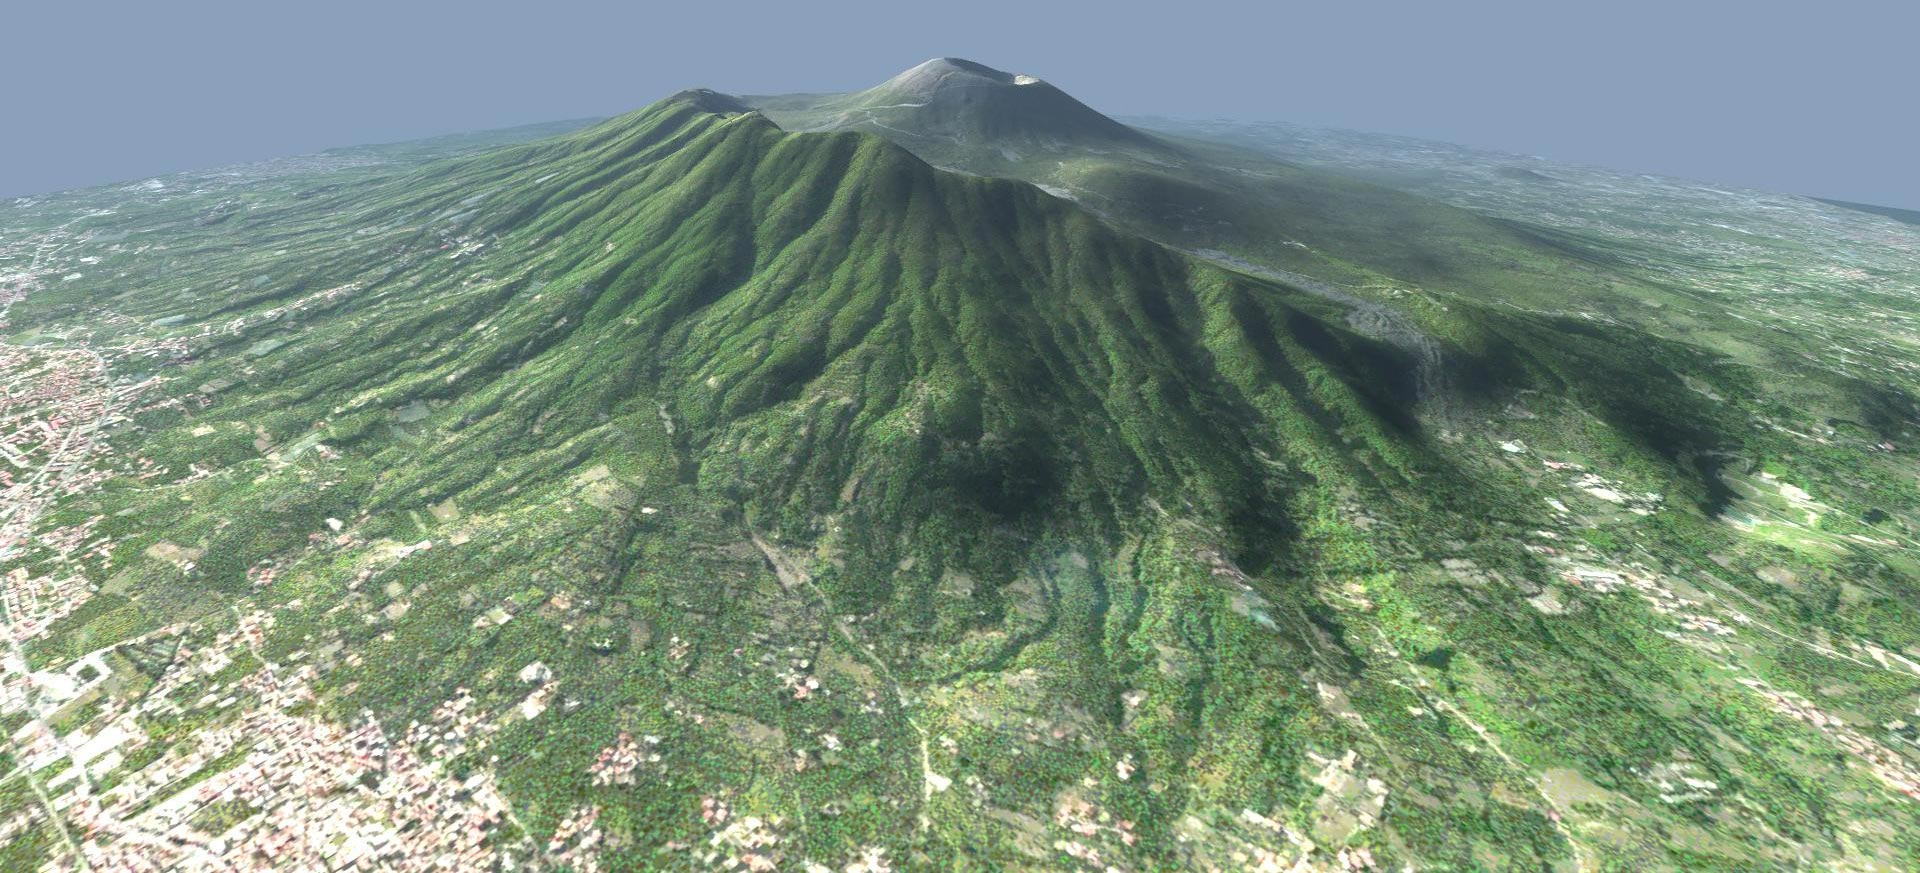 From Google Maps And Heightmaps To 3d Terrain – Fondos de Pantalla